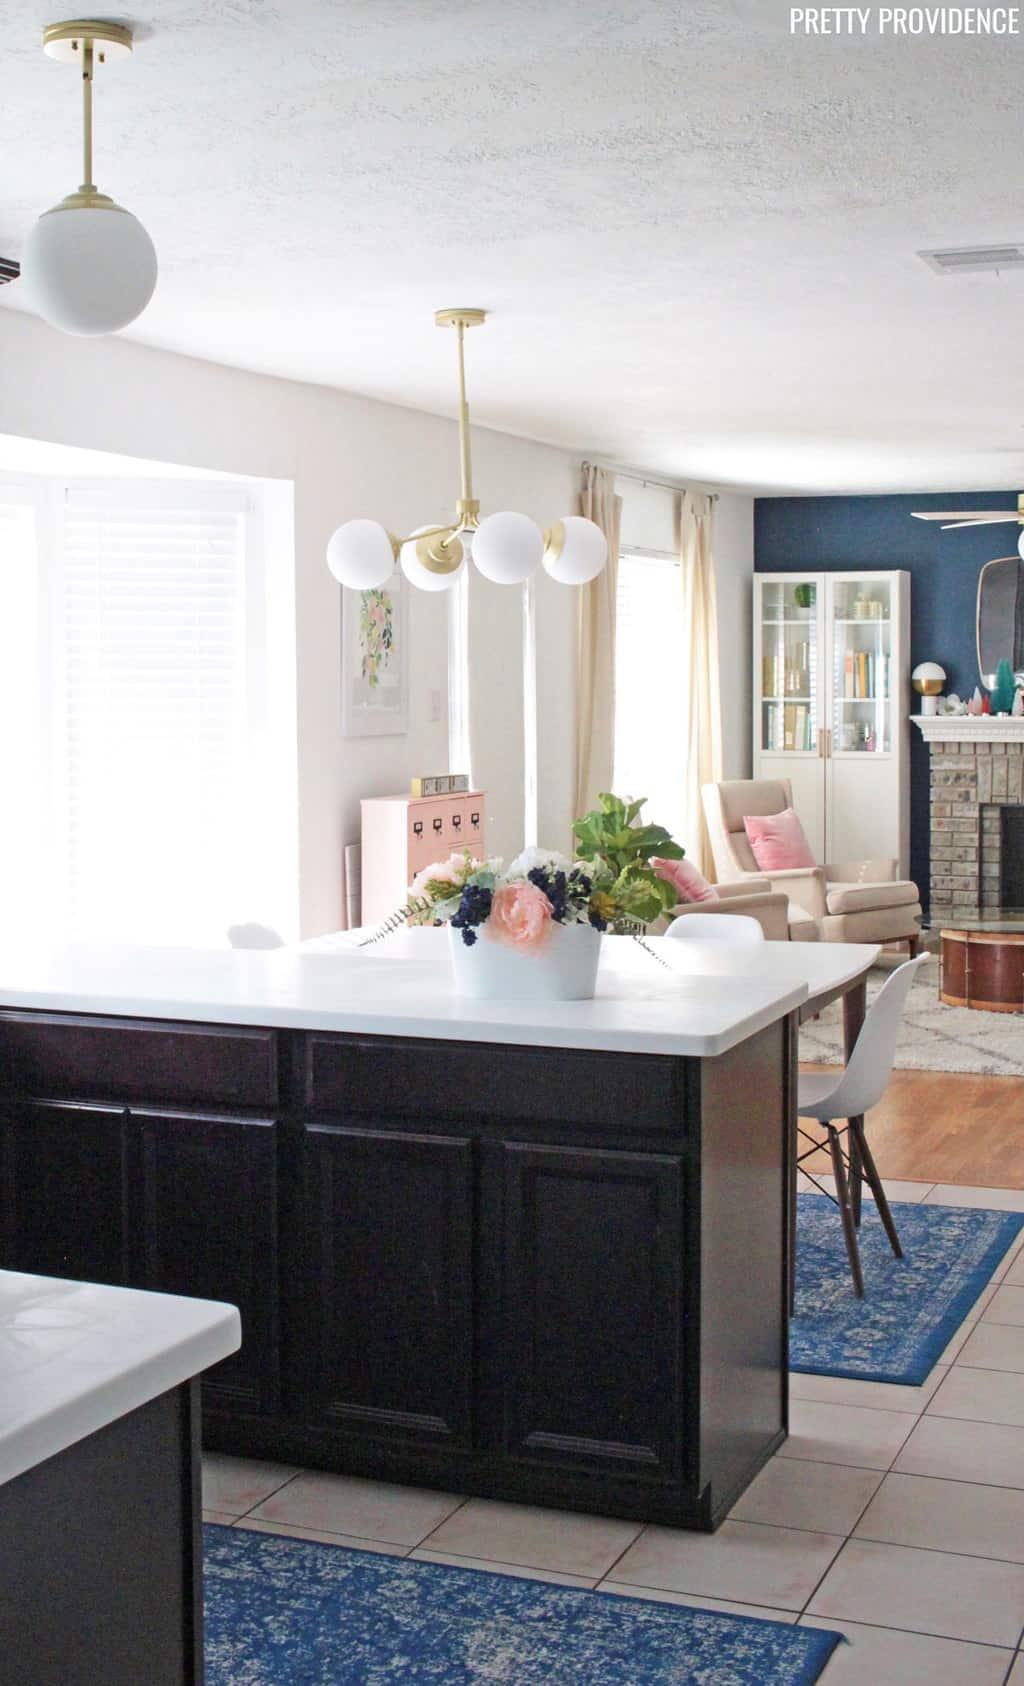 Espresso kitchen cabinets white countertops, gold and white hunter hepburn chandelier, flowers.